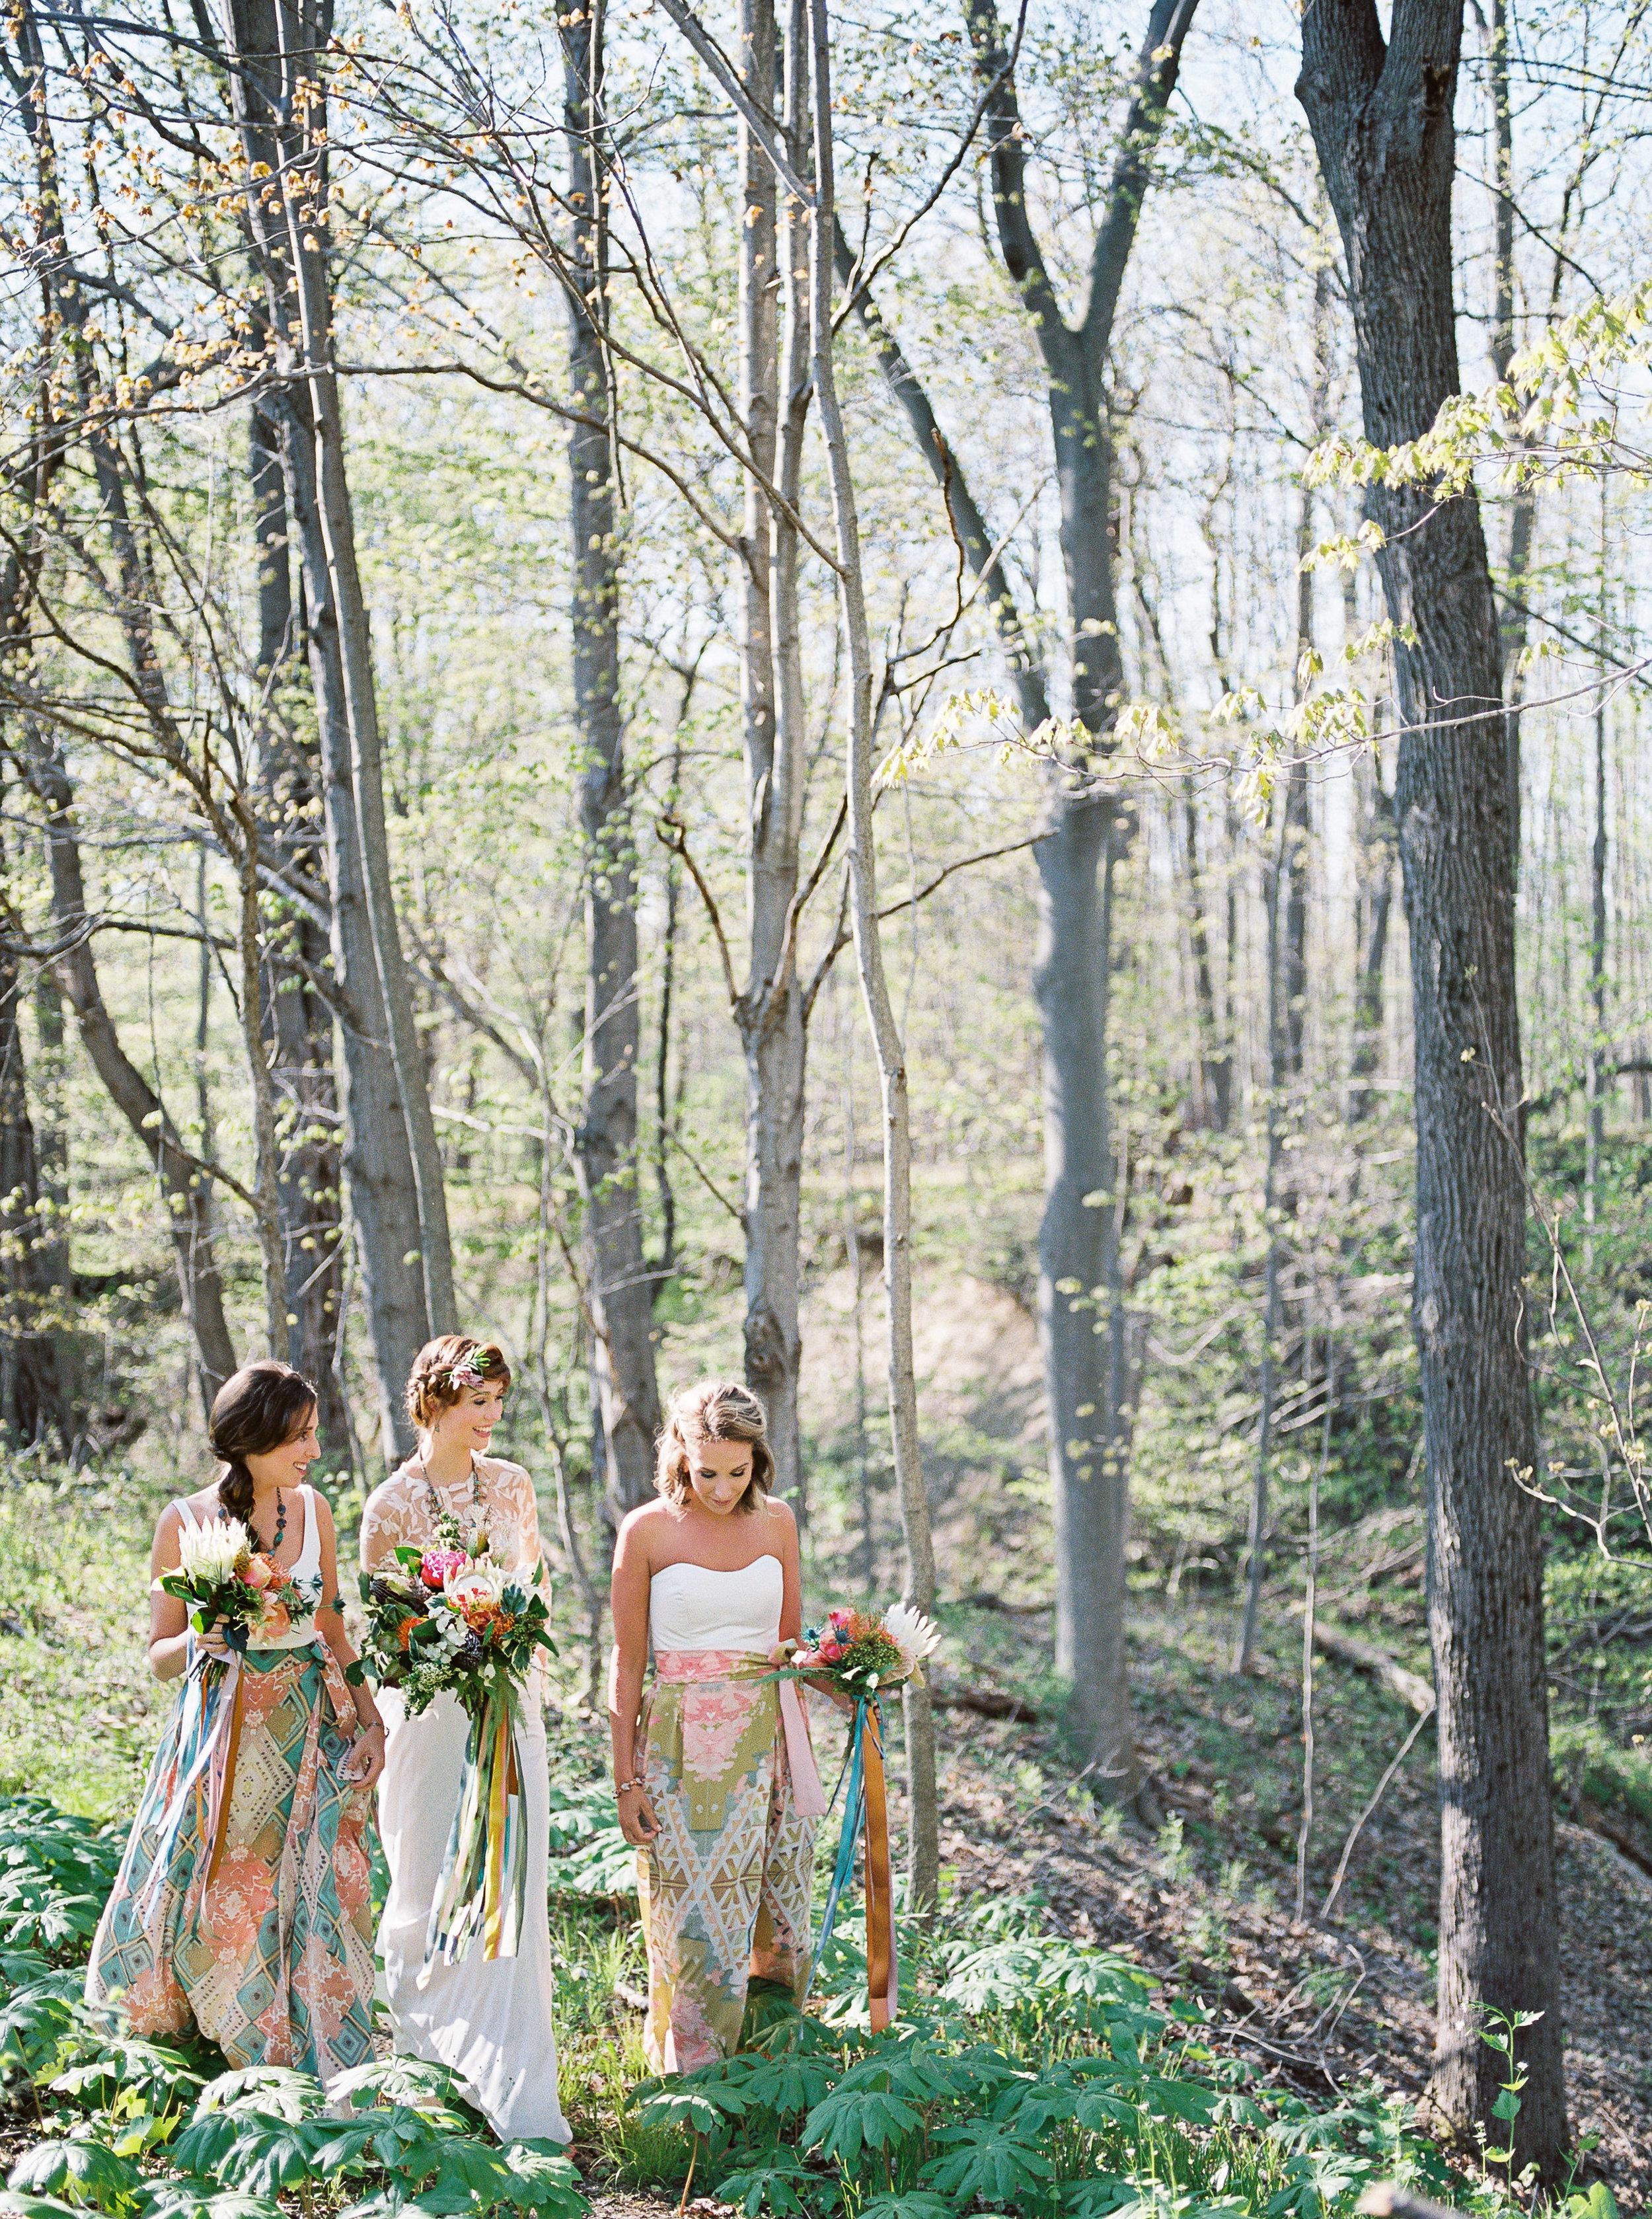 Alexandra-Elise-Photography-Ali-Reed-Film-Wedding-Photographer-Ithaca-New-York-Firelight-Camps-041.jpg